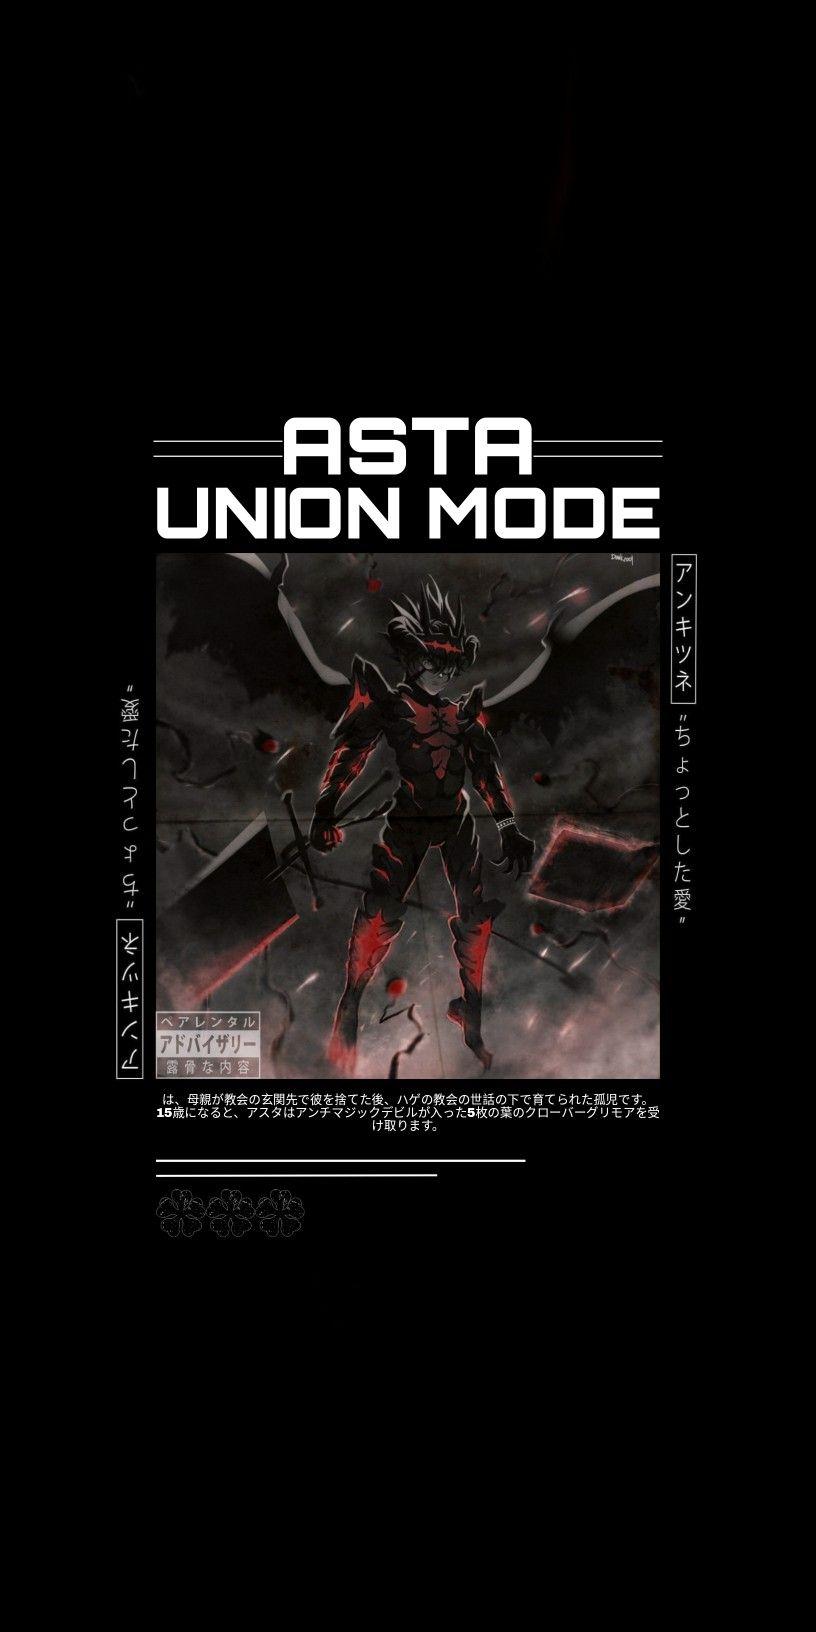 Asta union mode